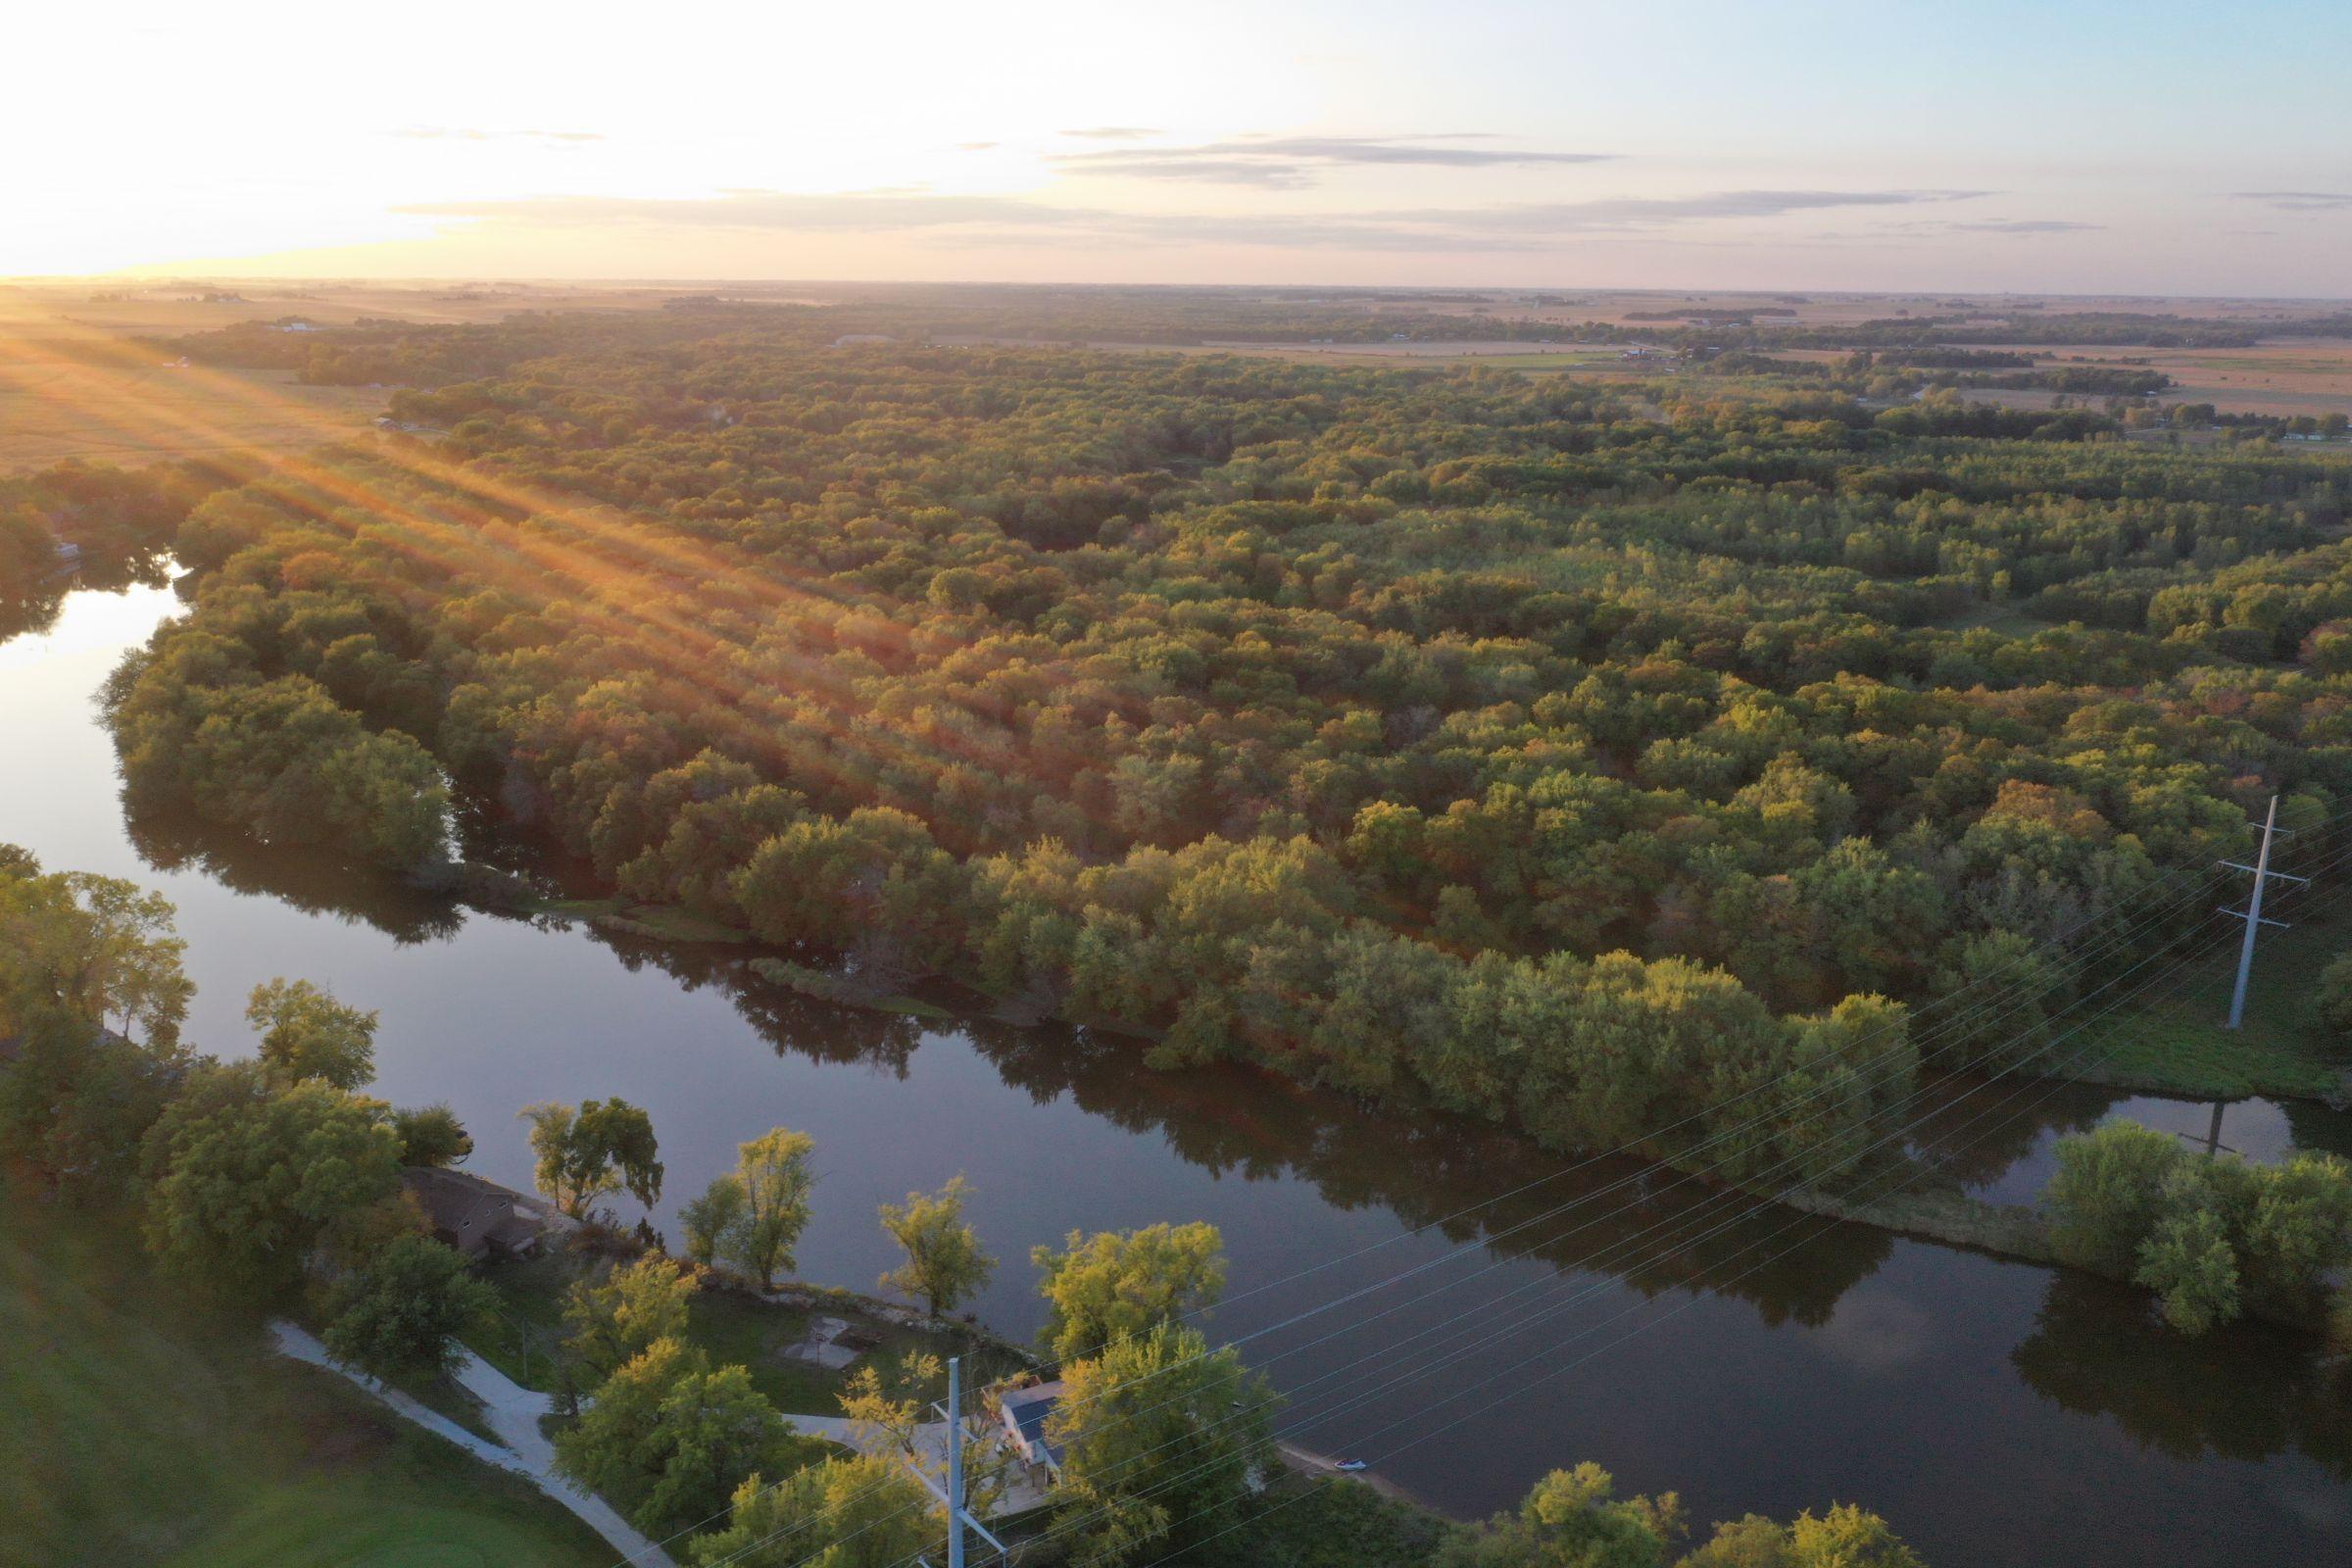 land-buchanan-county-iowa-33-acres-listing-number-14906-1-2020-10-28-160515.JPG